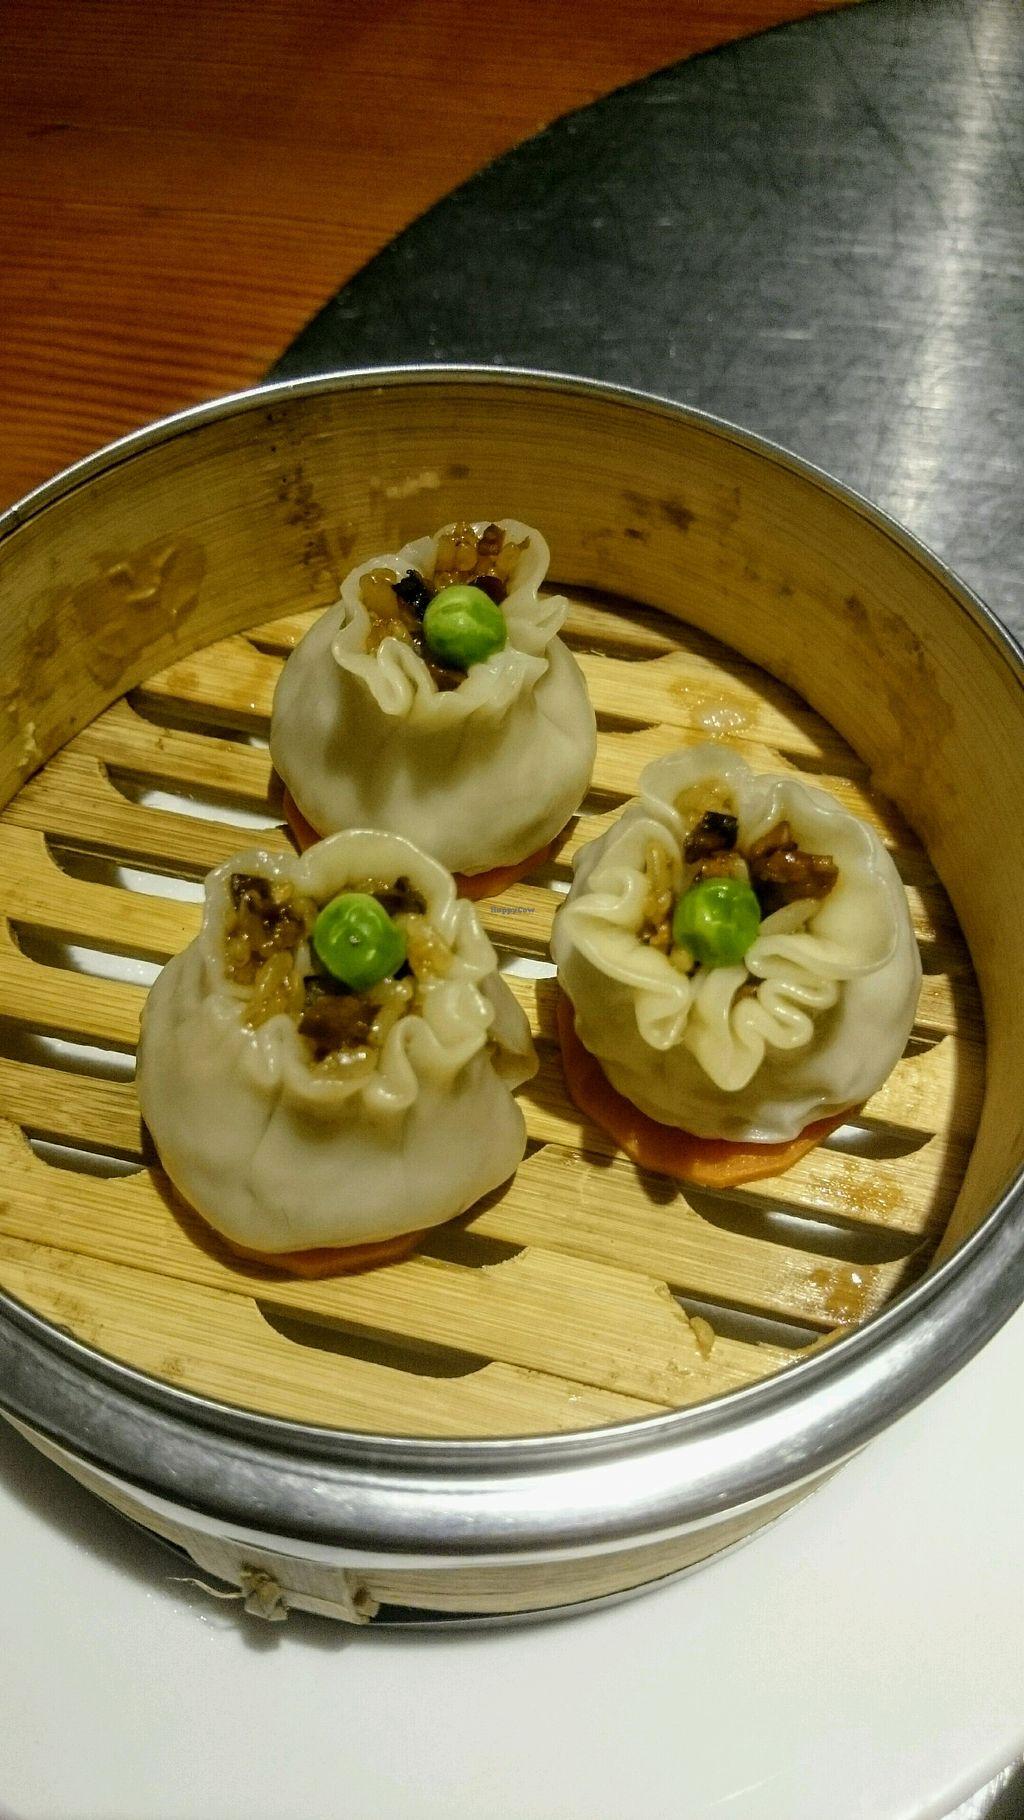 "Photo of Vegetarian Life Style - Zao Zi Shu - Gubei  by <a href=""/members/profile/MonikaZar"">MonikaZar</a> <br/>Dumplings  <br/> February 20, 2018  - <a href='/contact/abuse/image/99522/361727'>Report</a>"